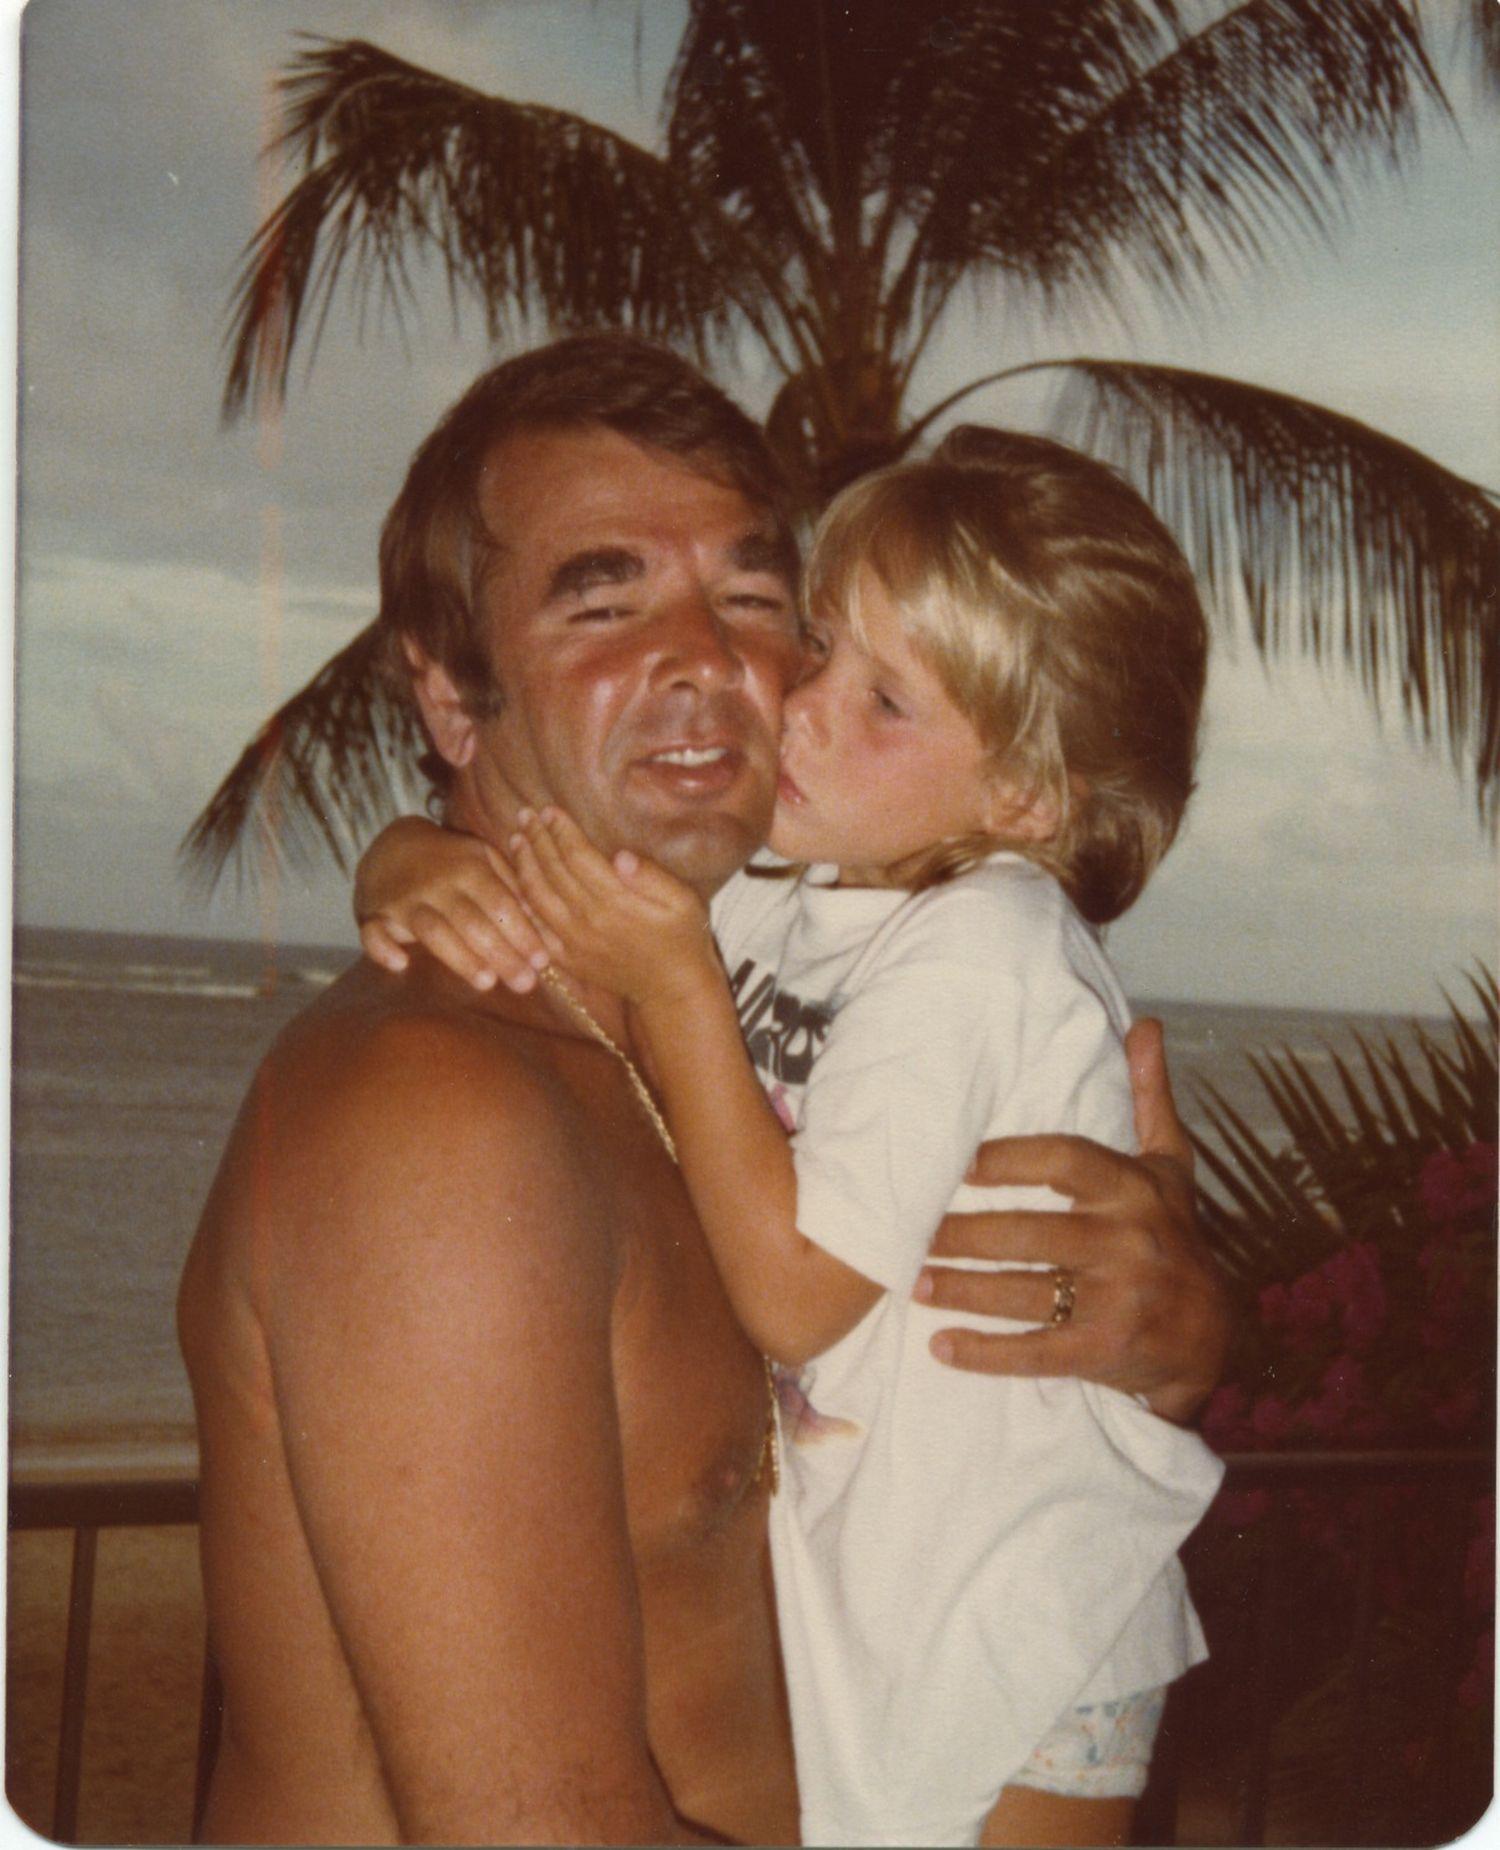 PP laddie.amanda.hawaii.'77 (1) (1)